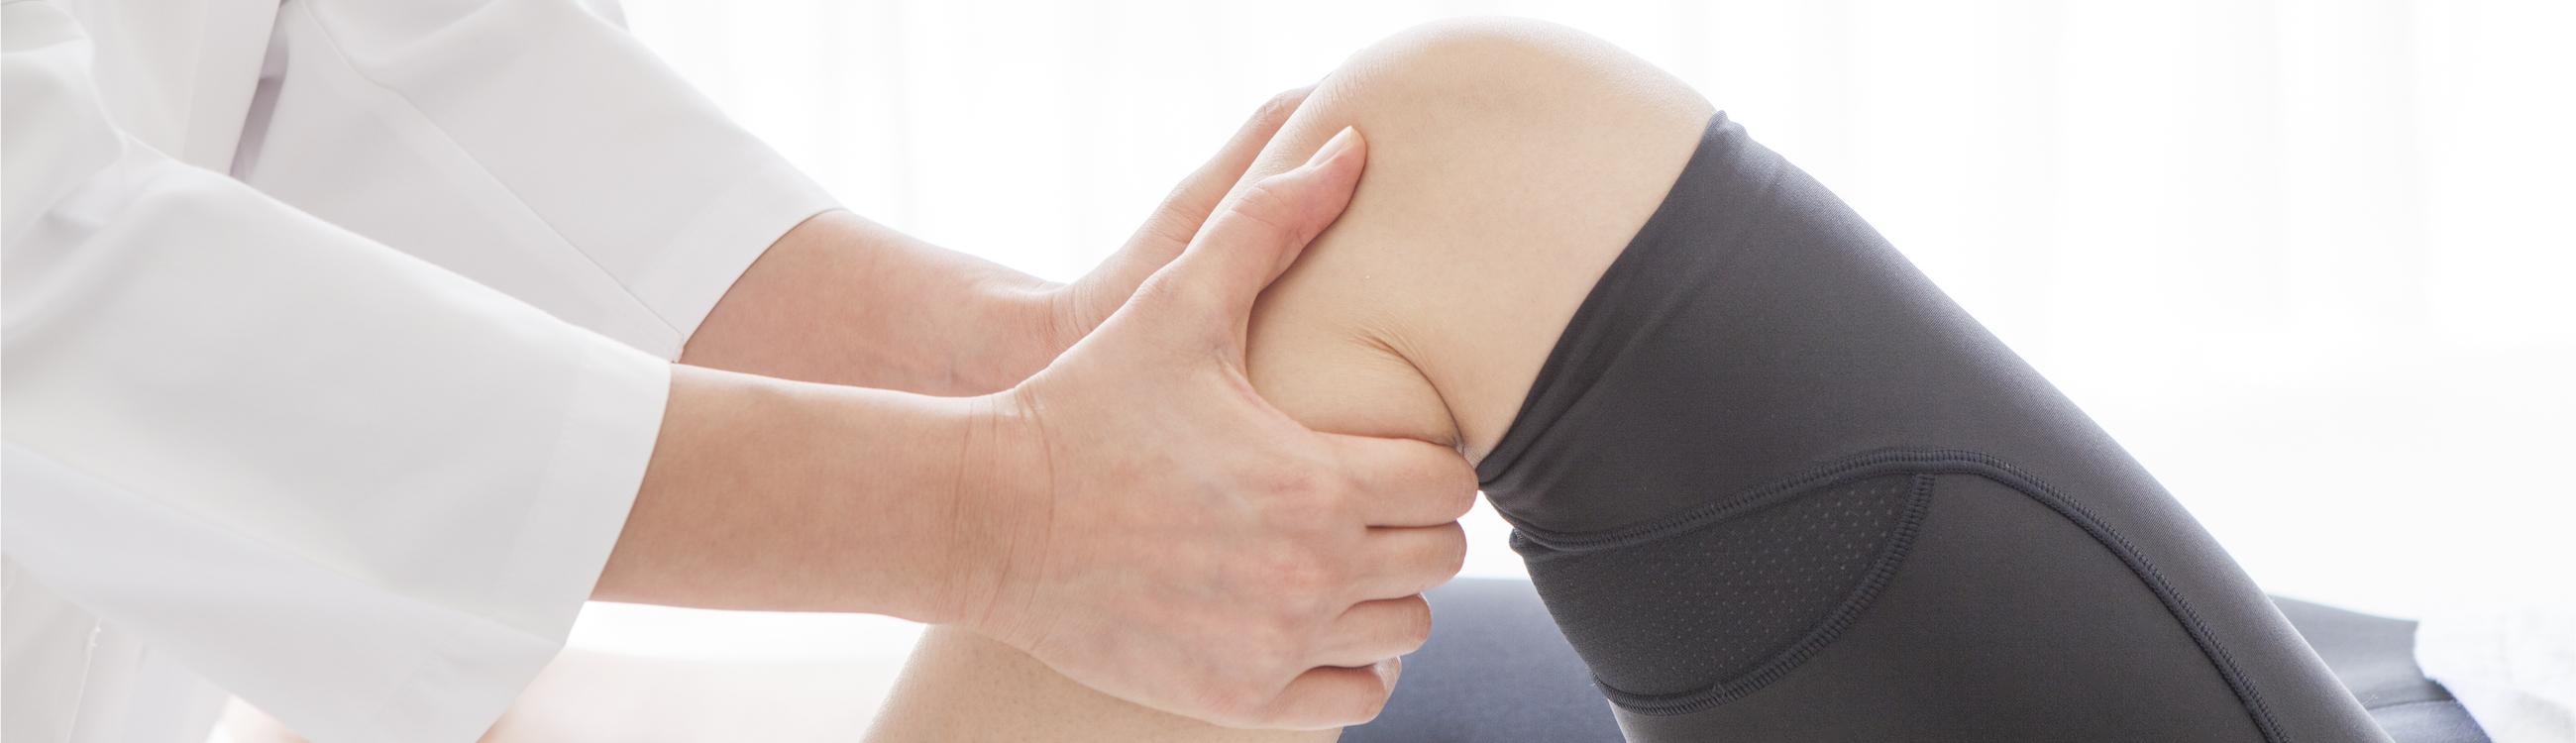 pain behind knee rehabilitation